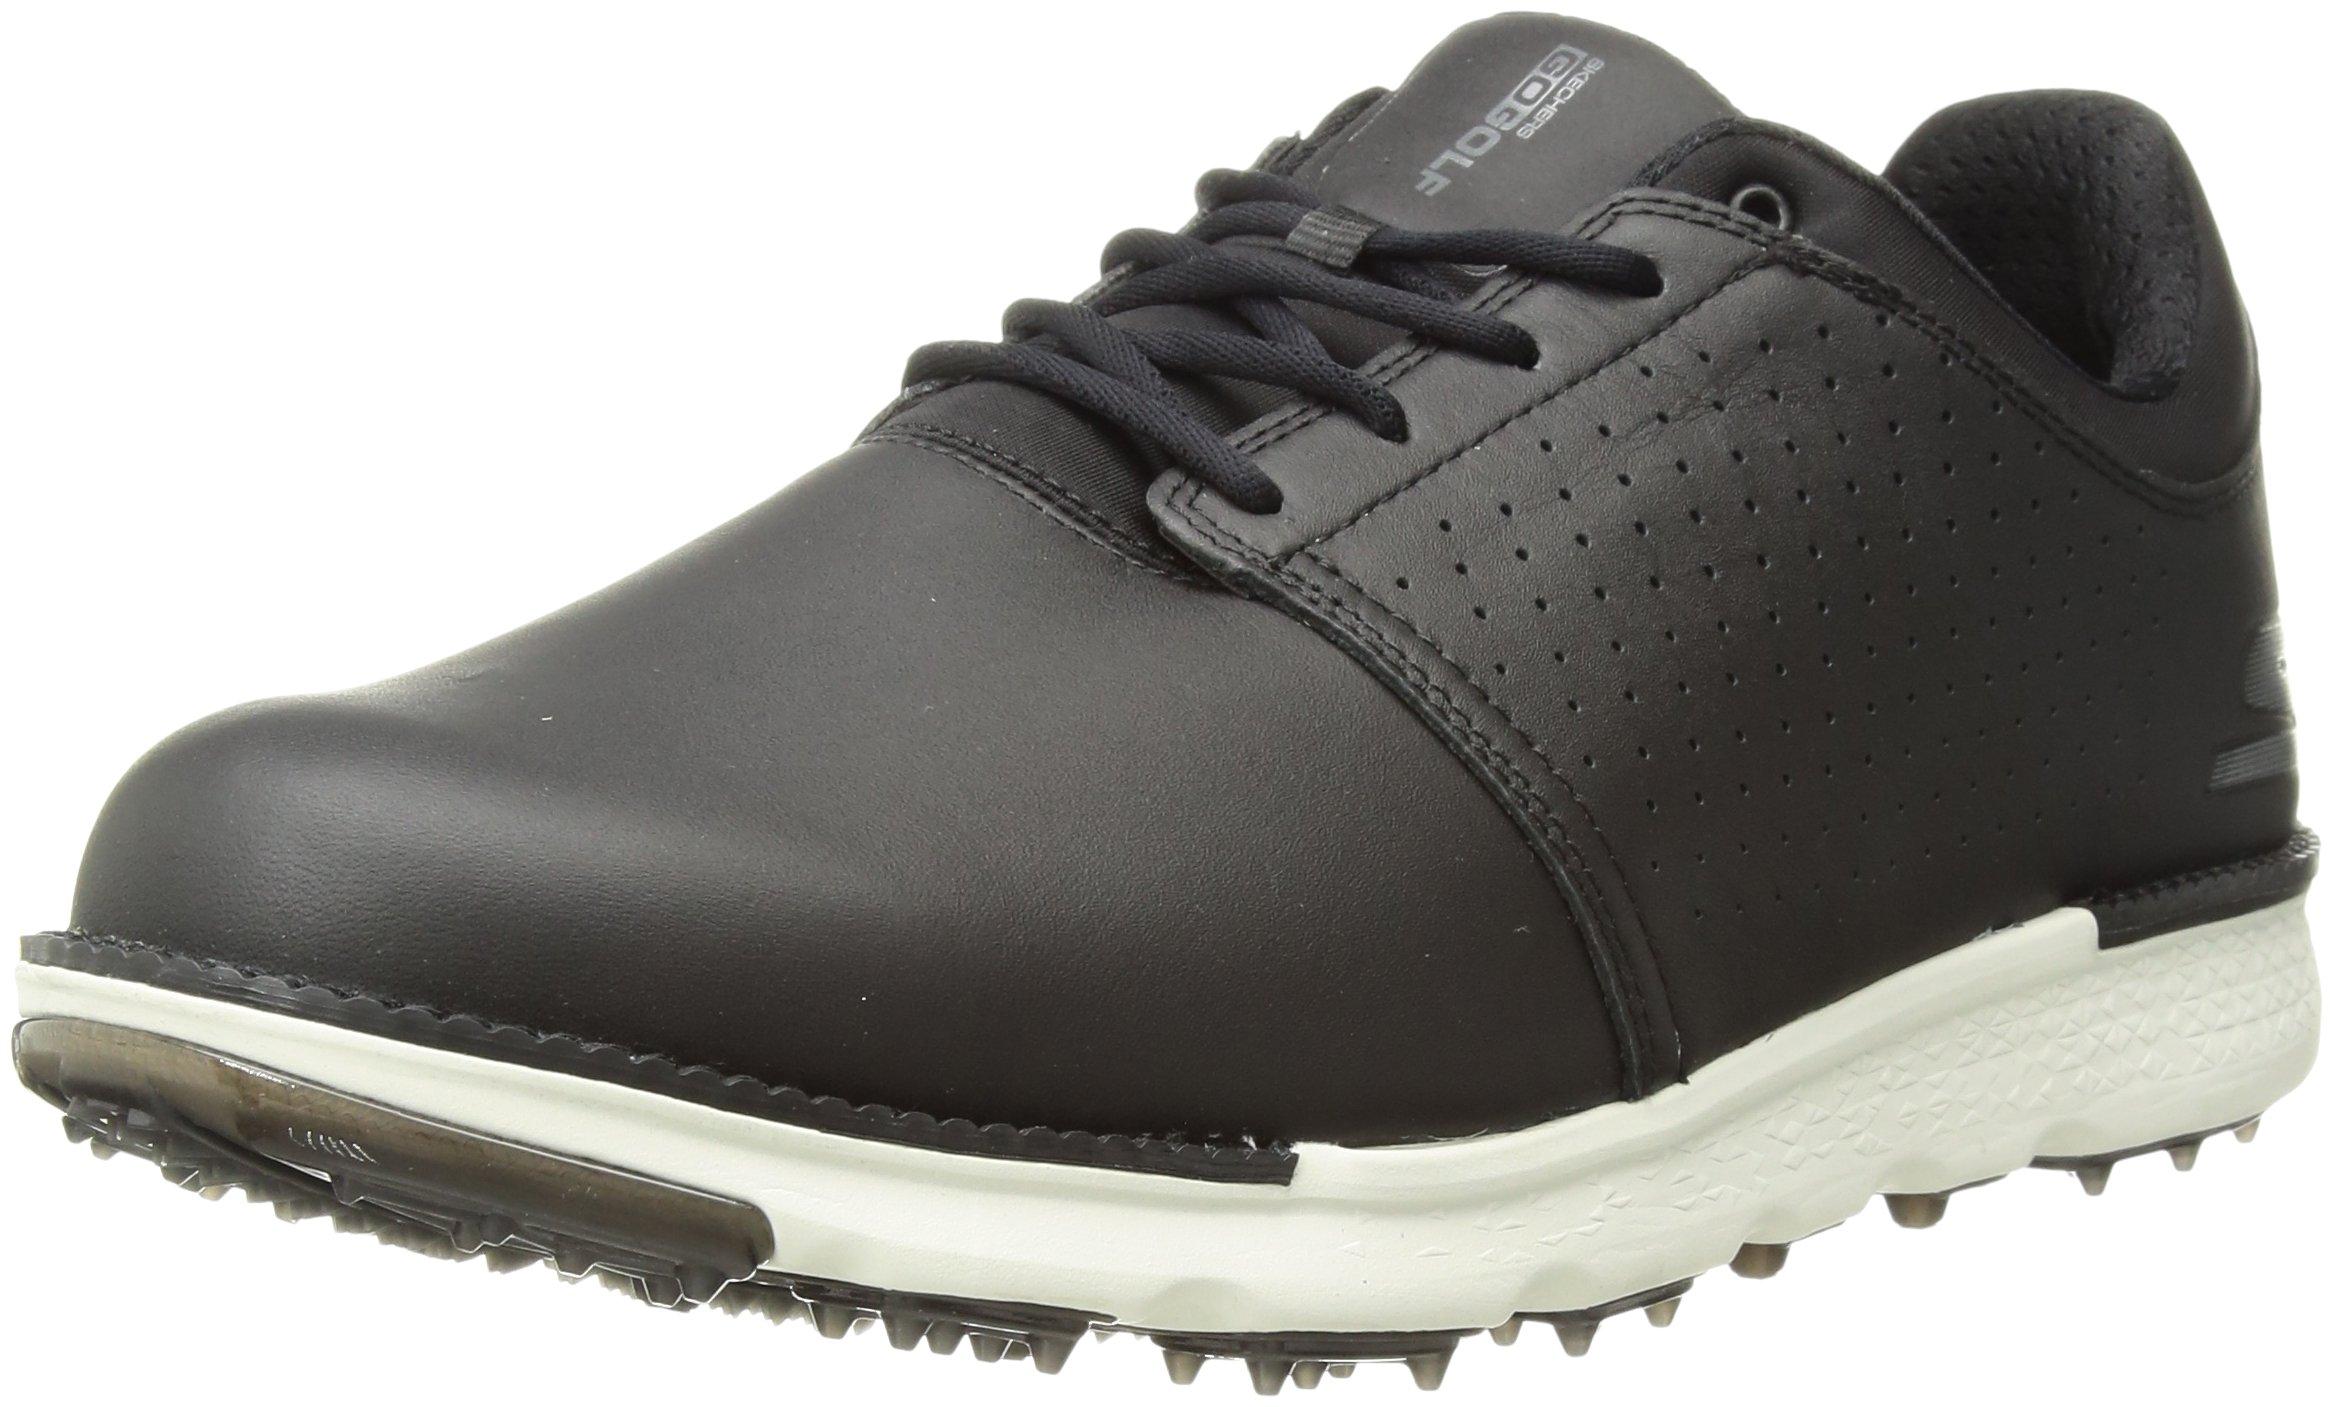 Skechers Performance Men's Go Elite 3 Approach LT Relaxed Fit Golf-Shoes,Black/White,11 M US